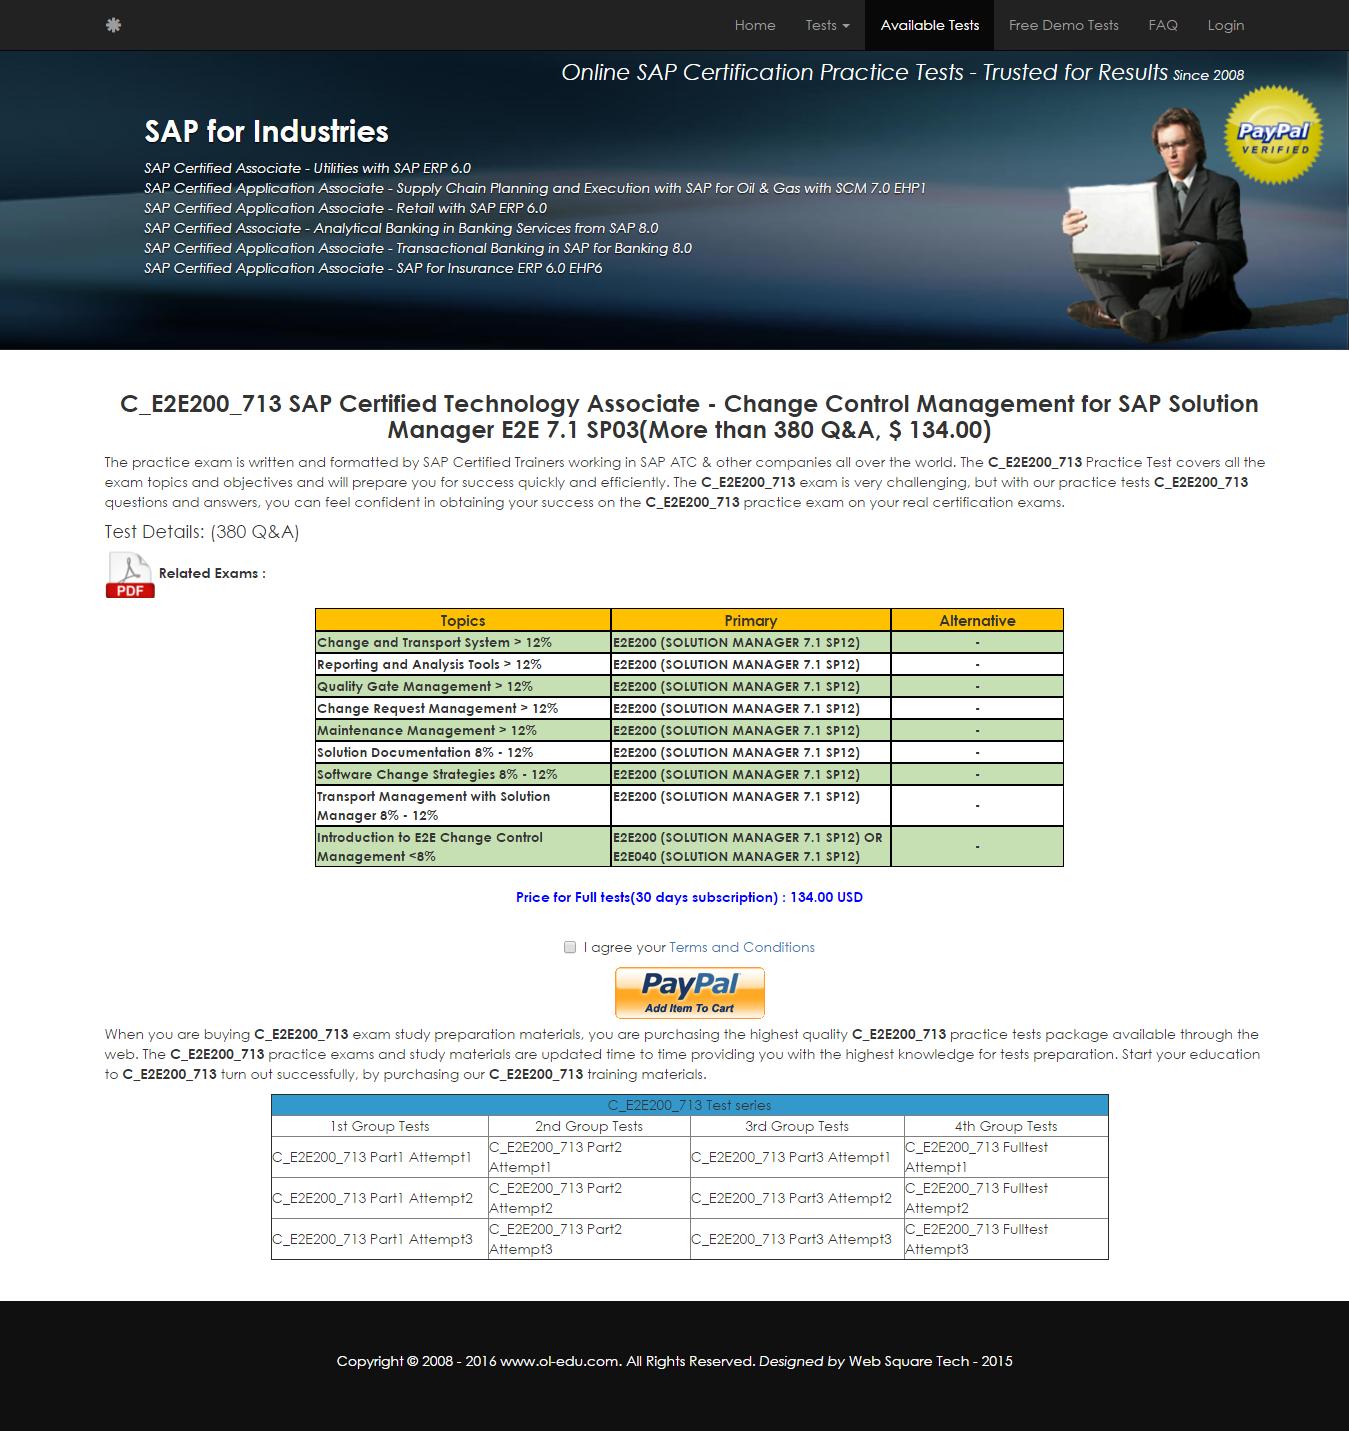 C E2e200 713 Ce2e200713 Sap Certified Technology Associate